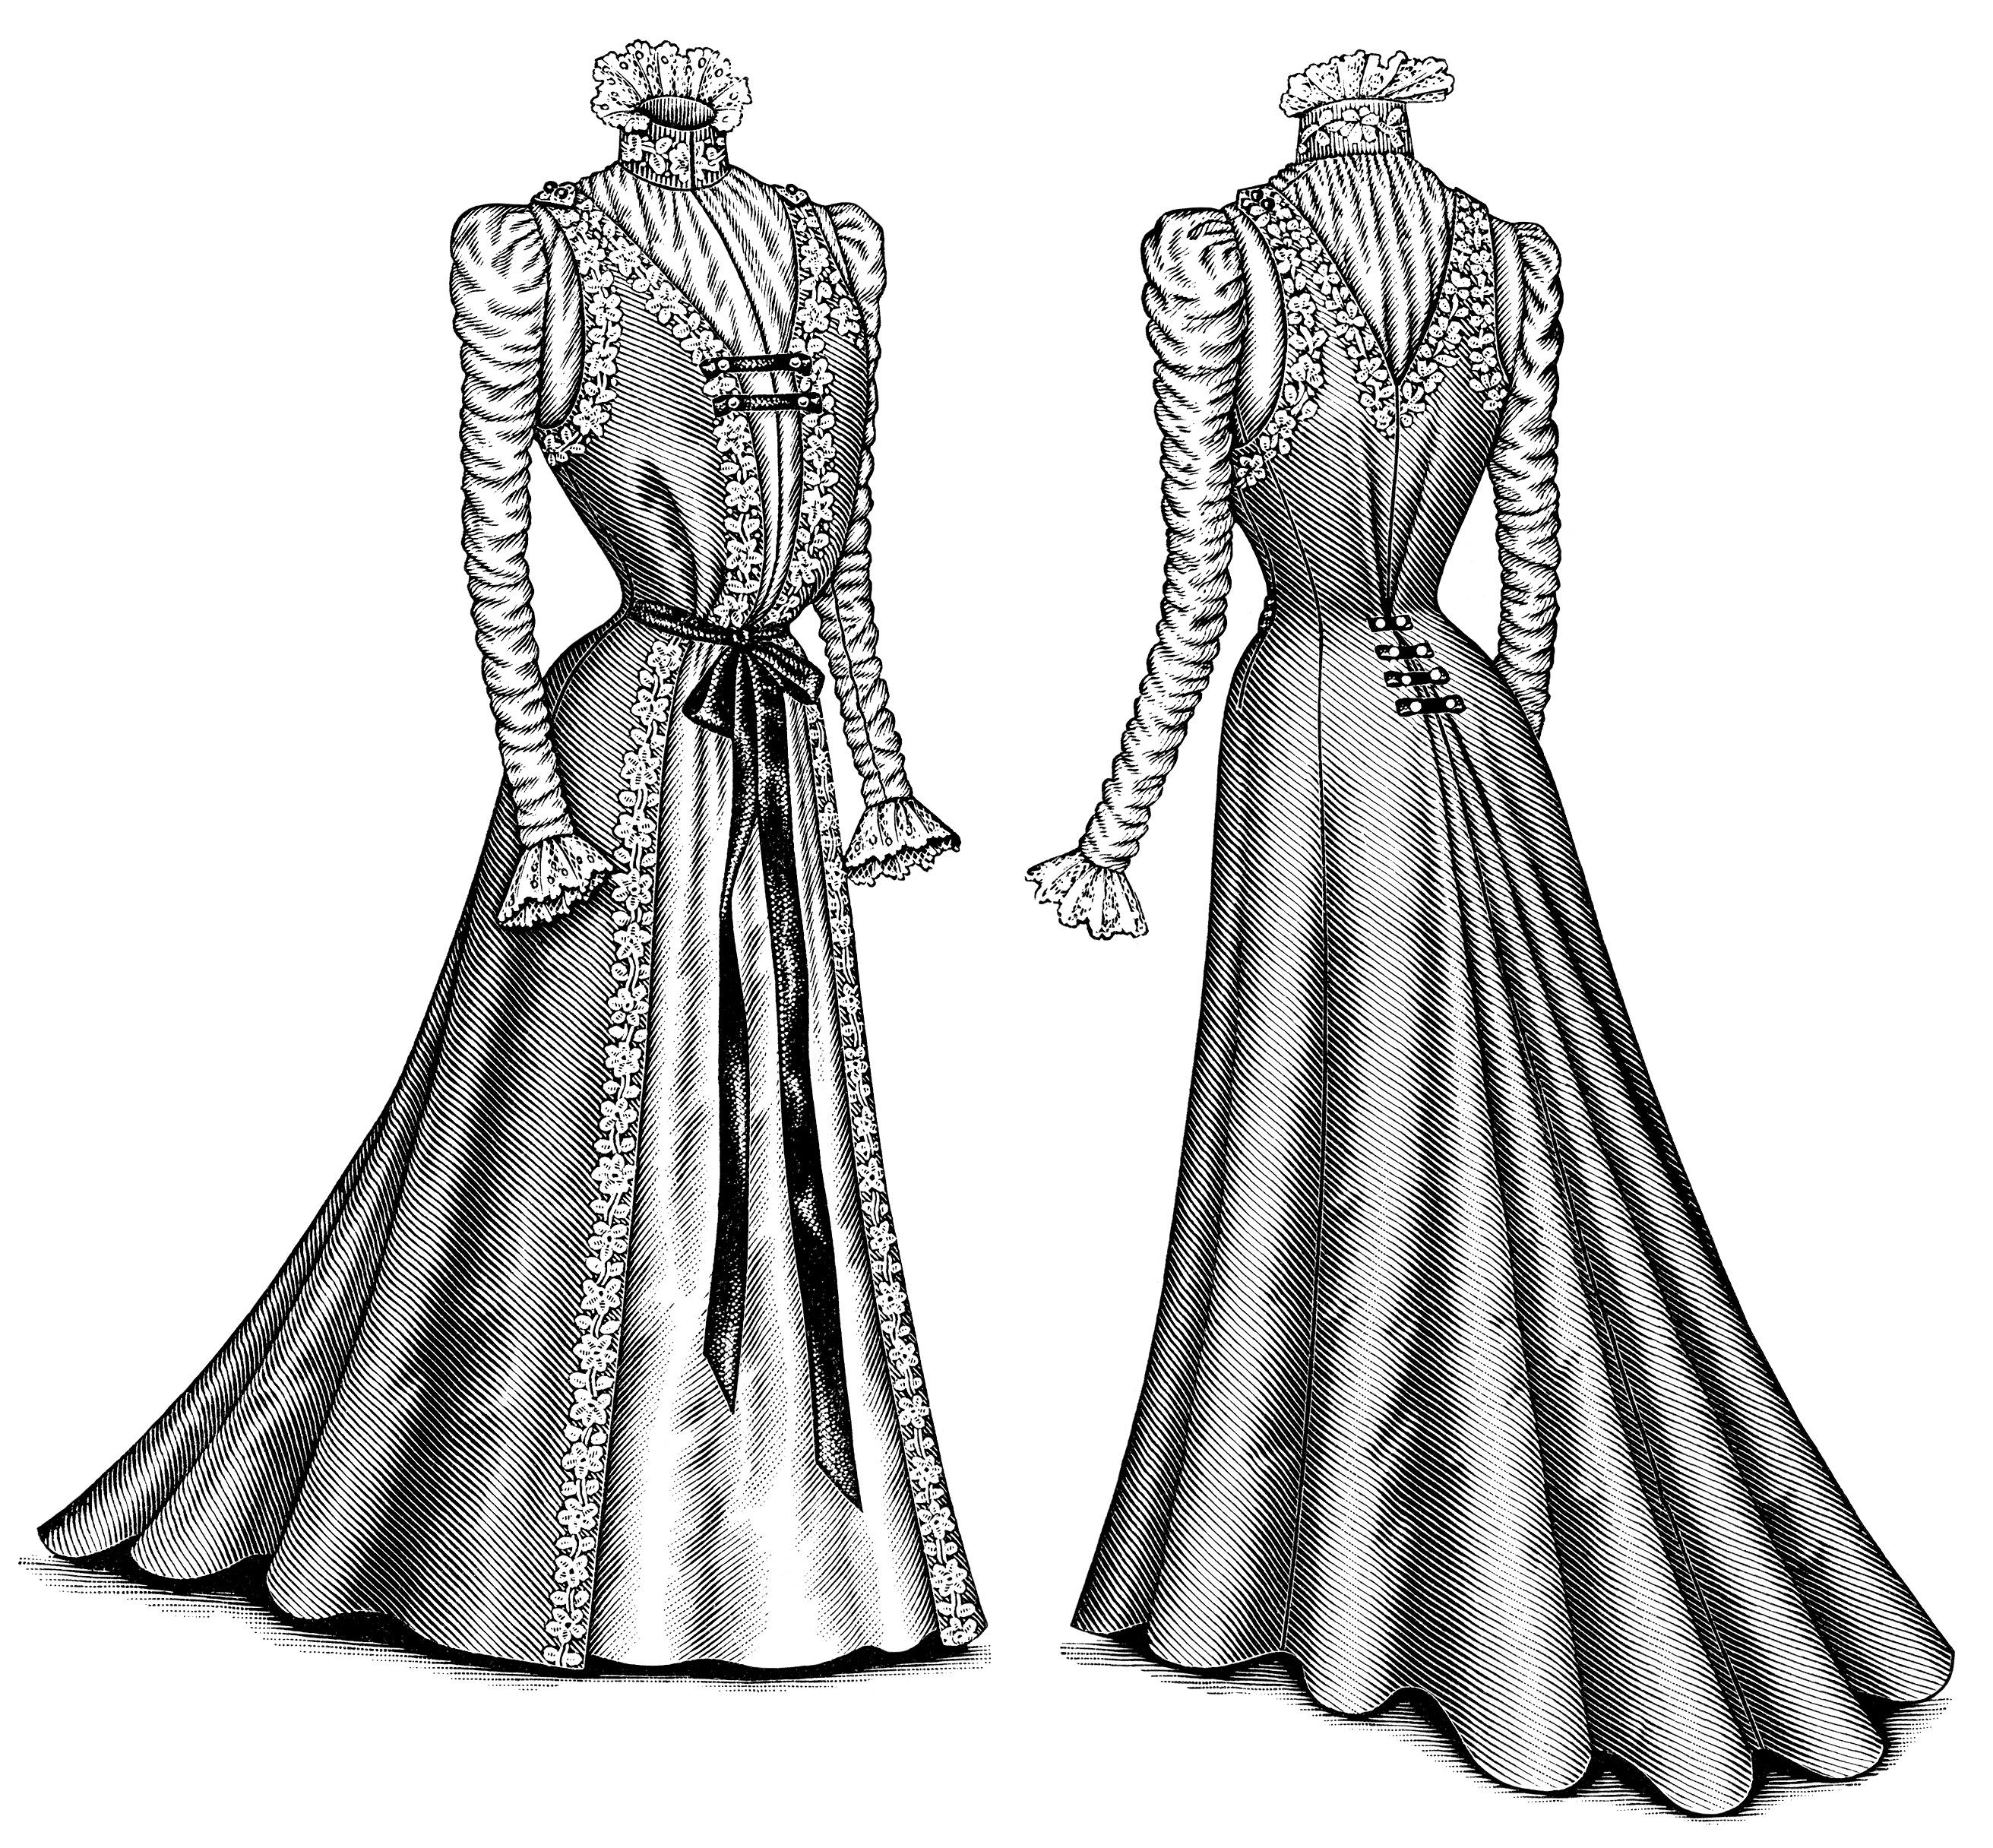 White Dress clipart printable Antique black Victorian fashion white